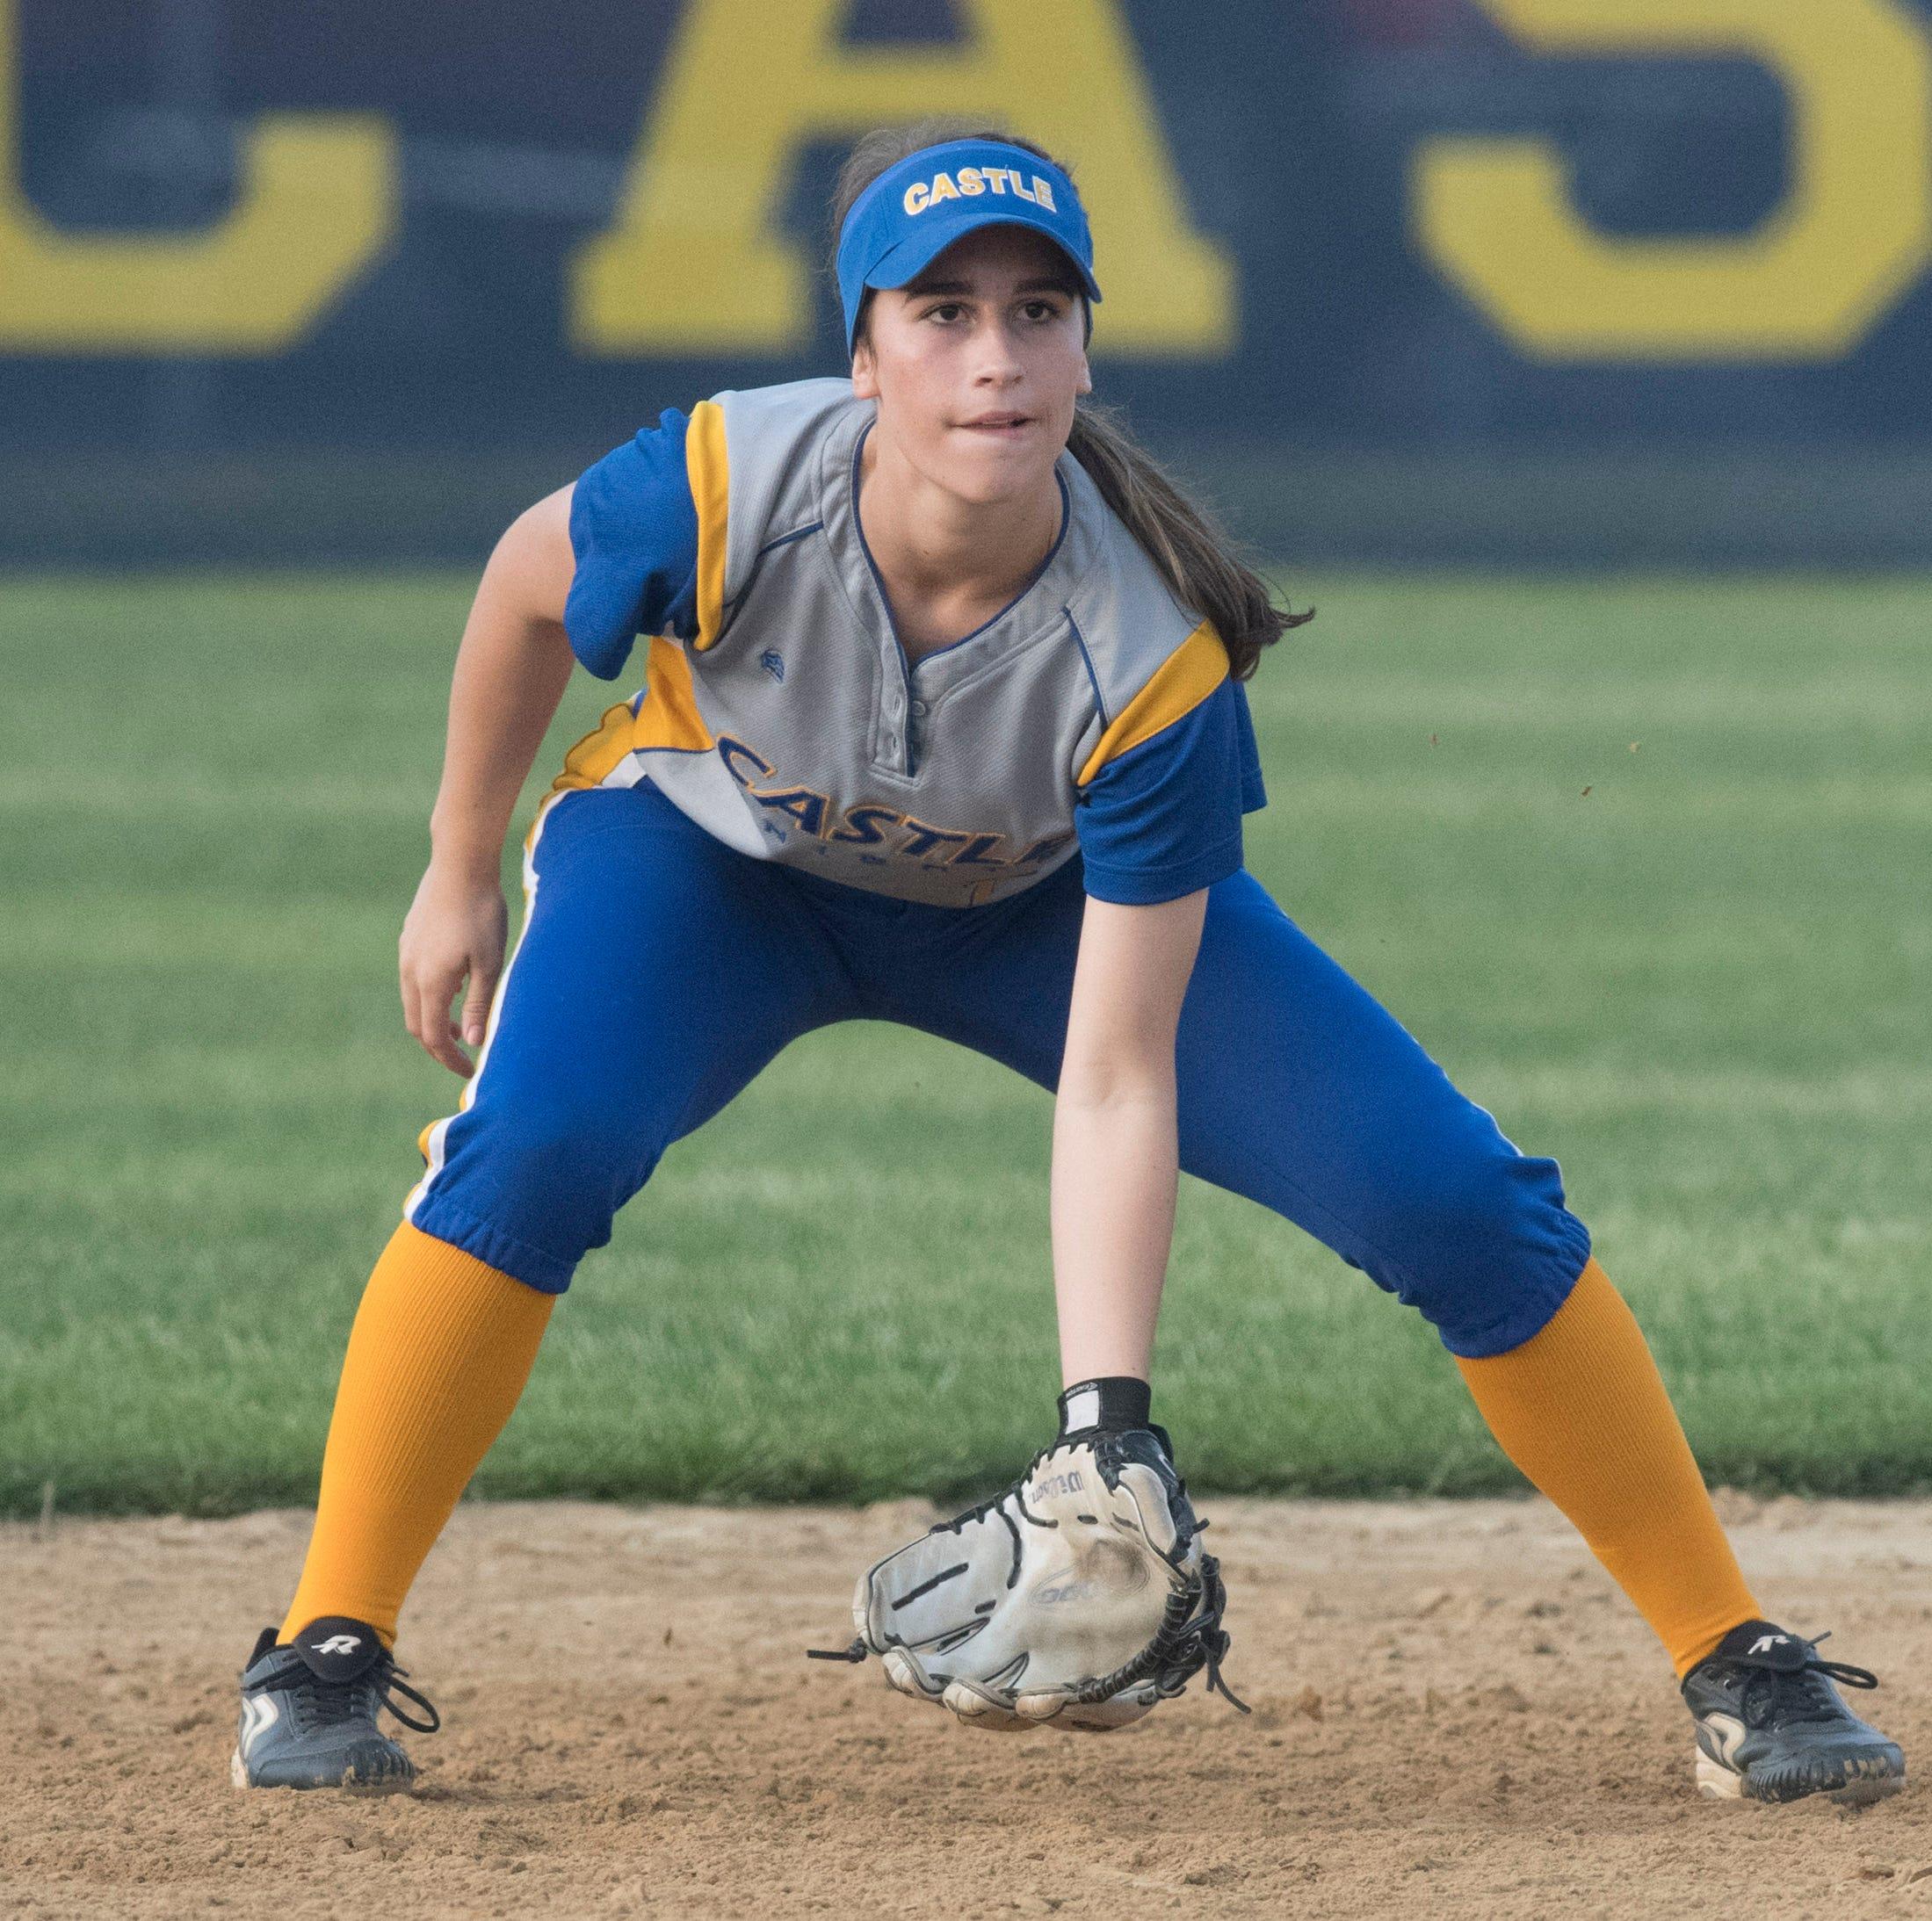 Ella Bassett provides versatility around the diamond for Castle softball